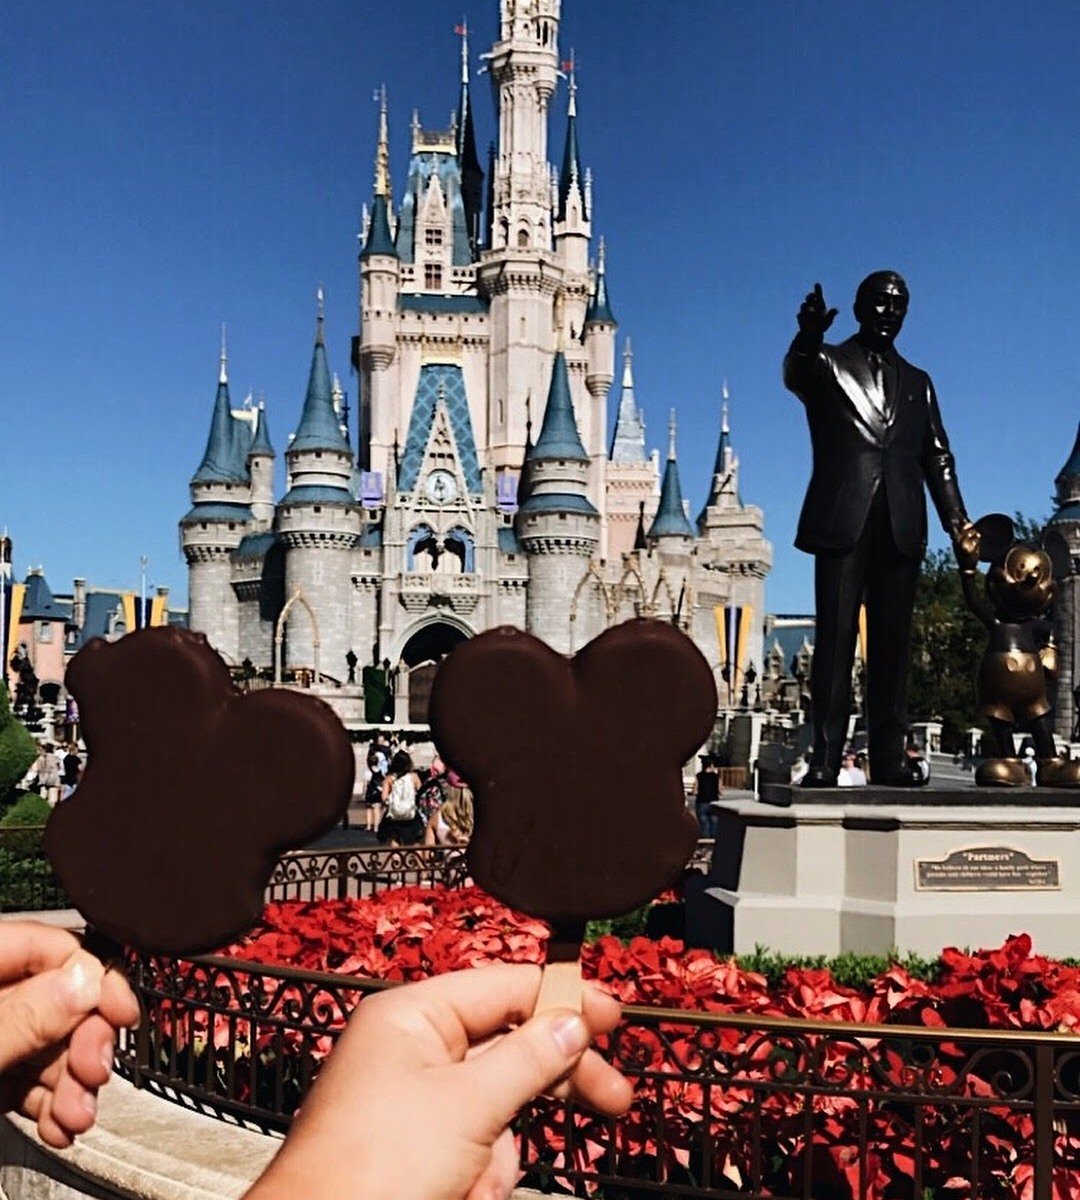 christmas time in disney world josie schoonover - Disneyworld At Christmas Time